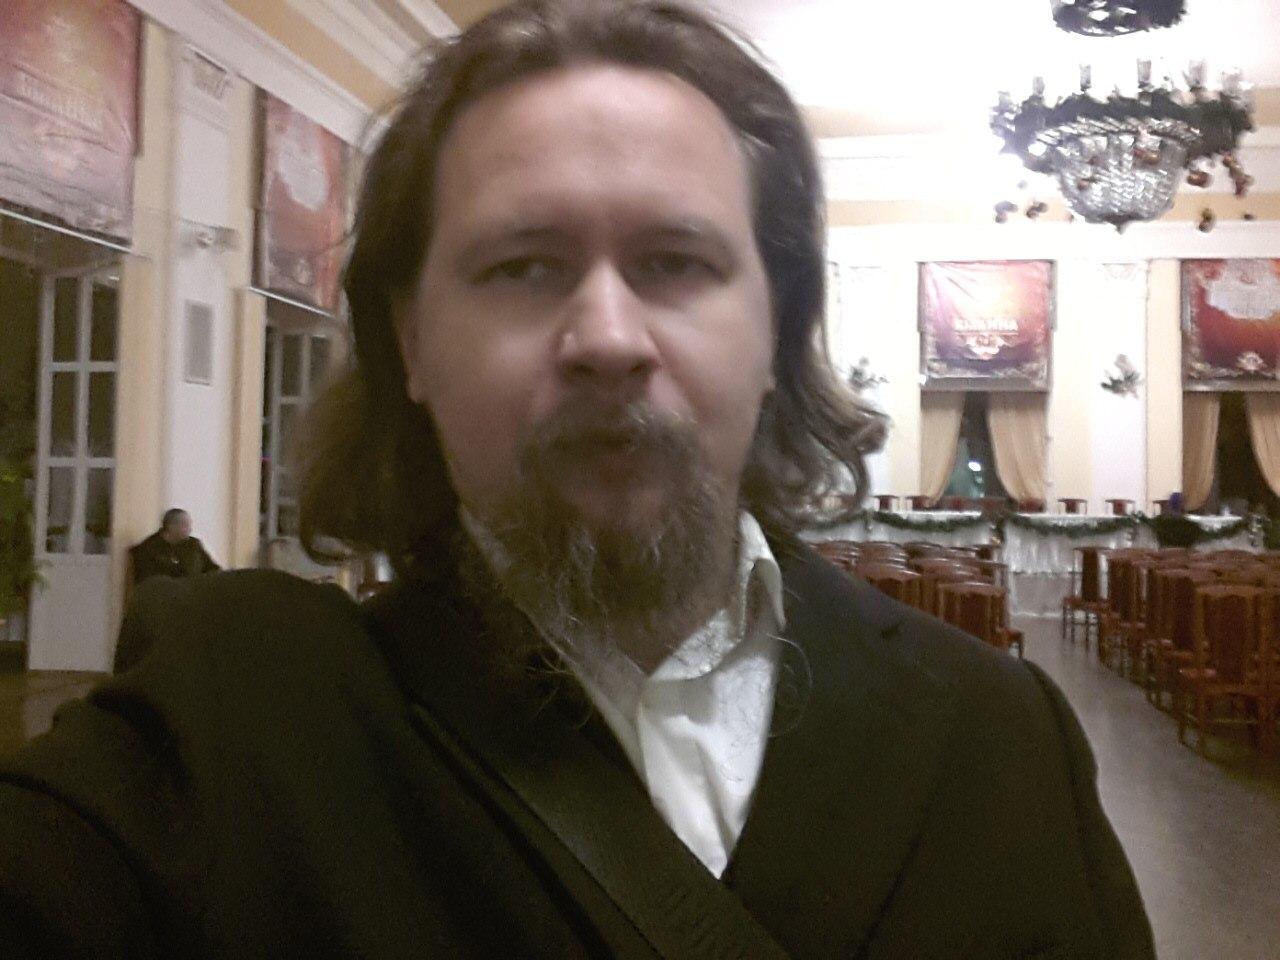 Православие против алкоголизма в Москве лечение от наркомании в брянске